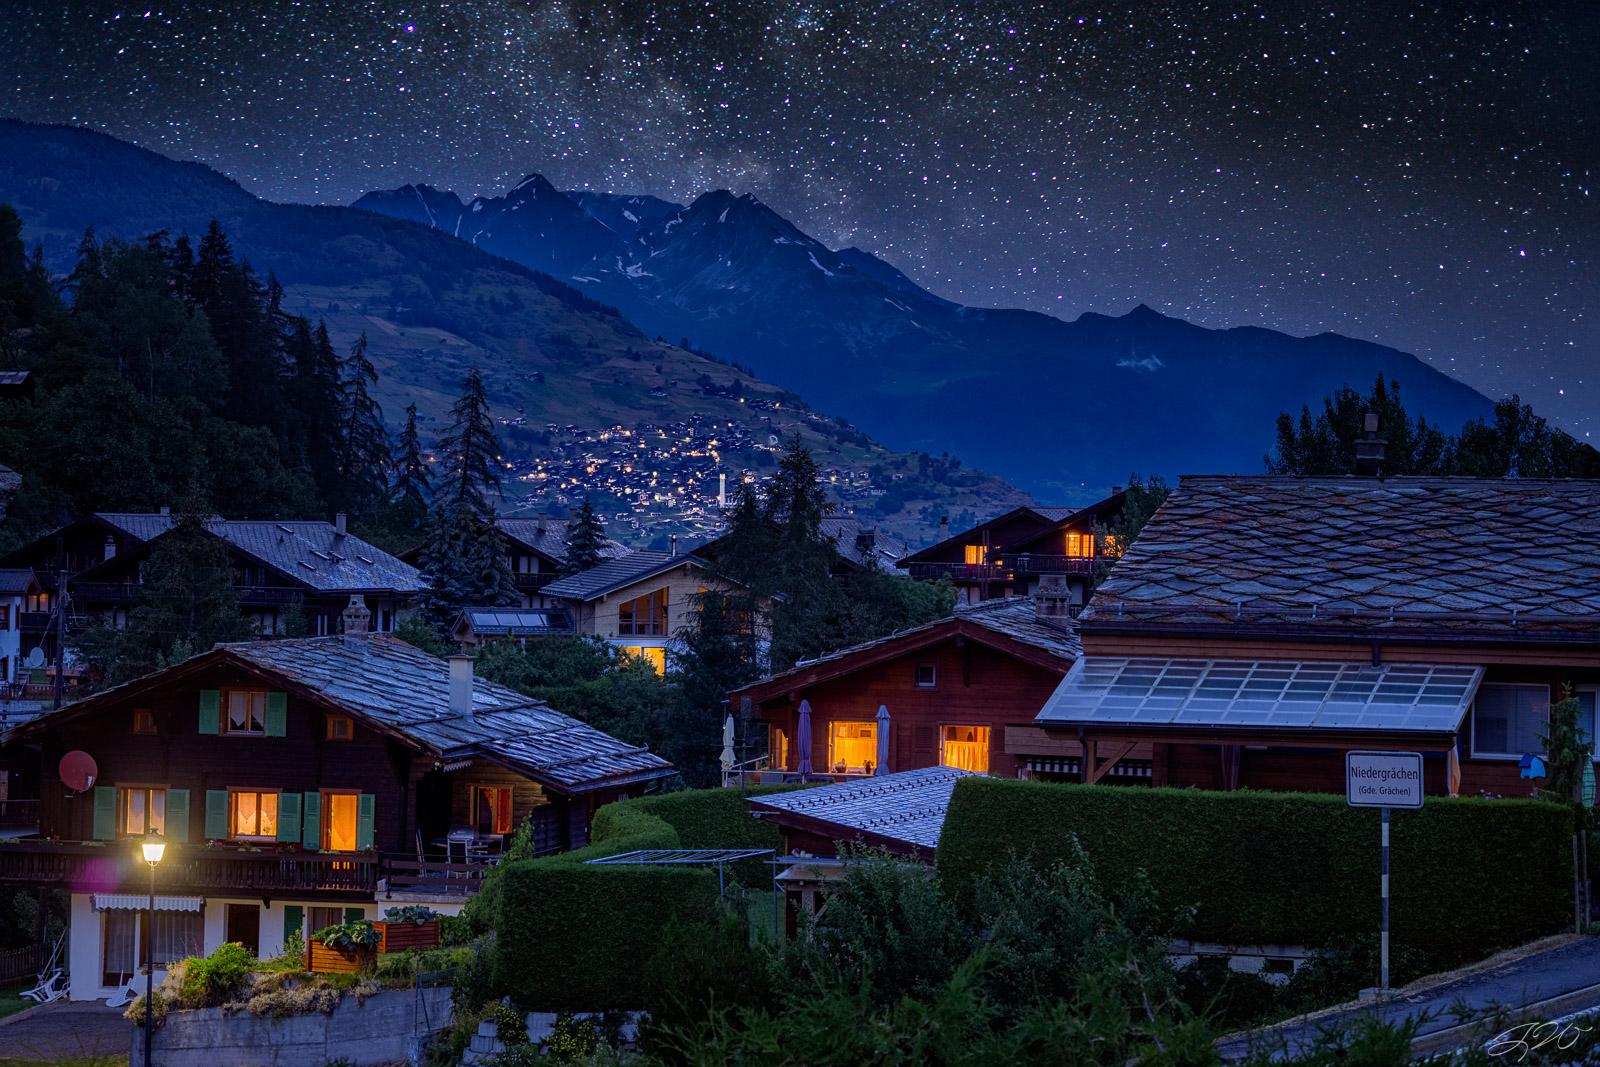 mountain, grächen, astrophotography, night sky, zermatt, matter valley, switzerland, europe, europaweg, tour du mont blanc, photo